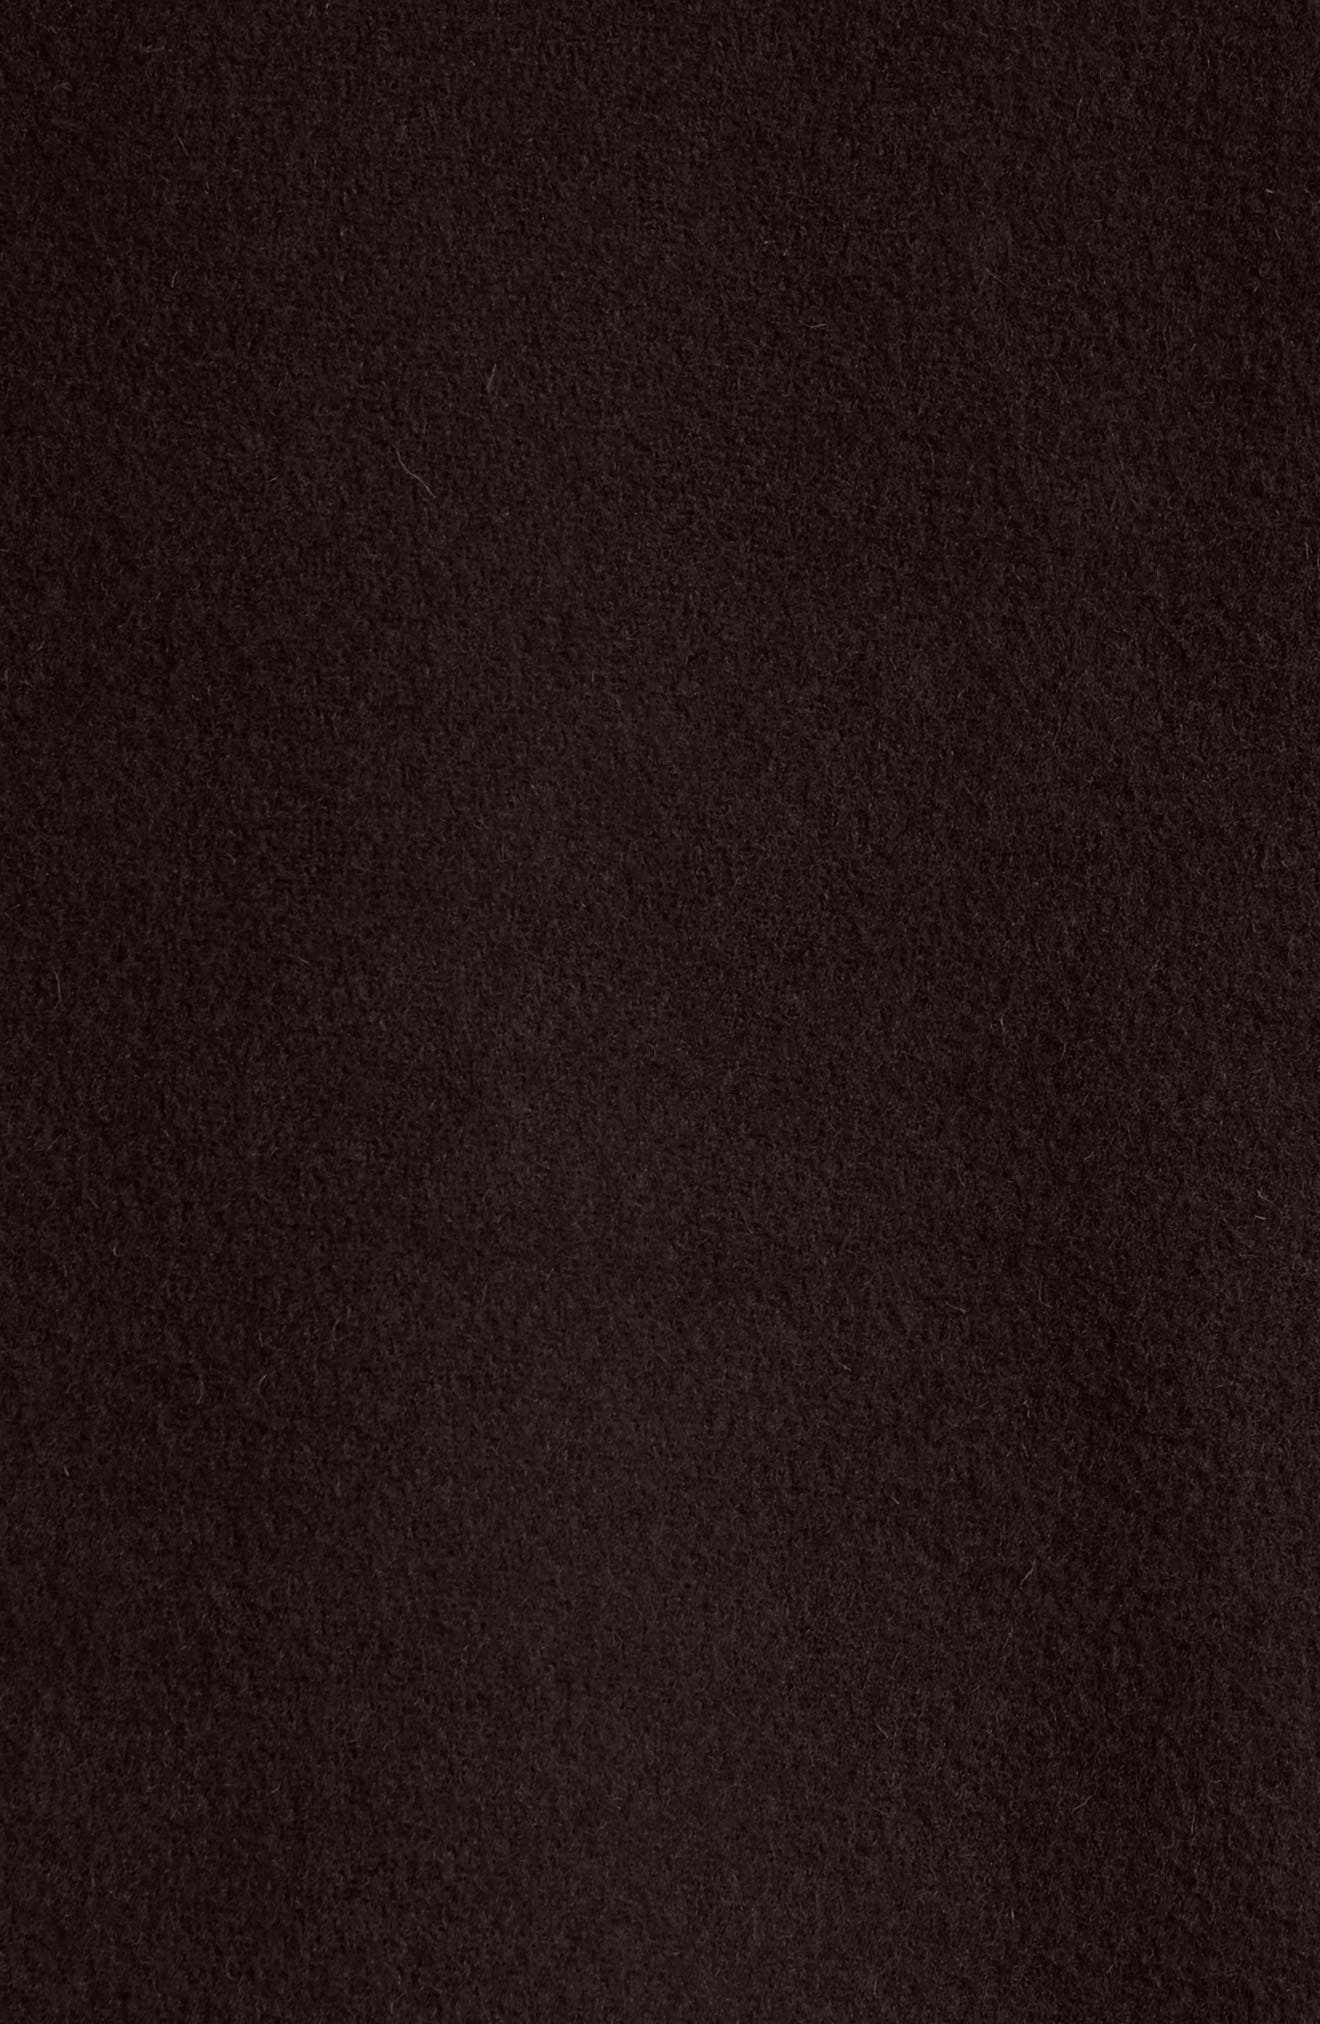 Mersey Wool Blend Duffle Coat,                             Alternate thumbnail 6, color,                             001